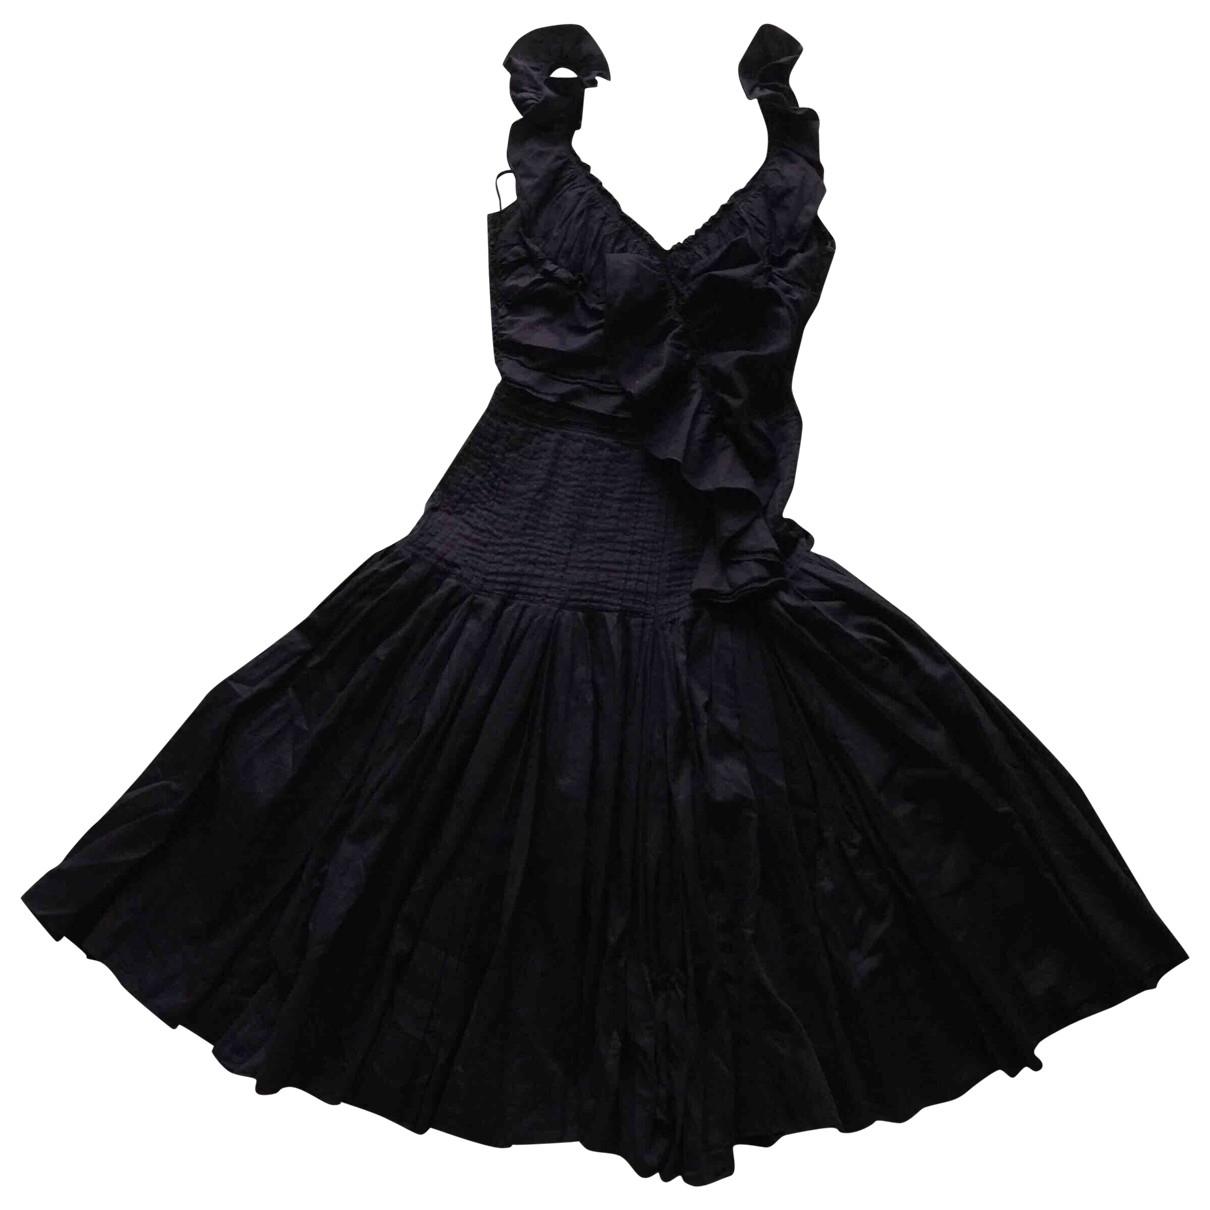 Prada \N Purple Cotton dress for Women 38 IT